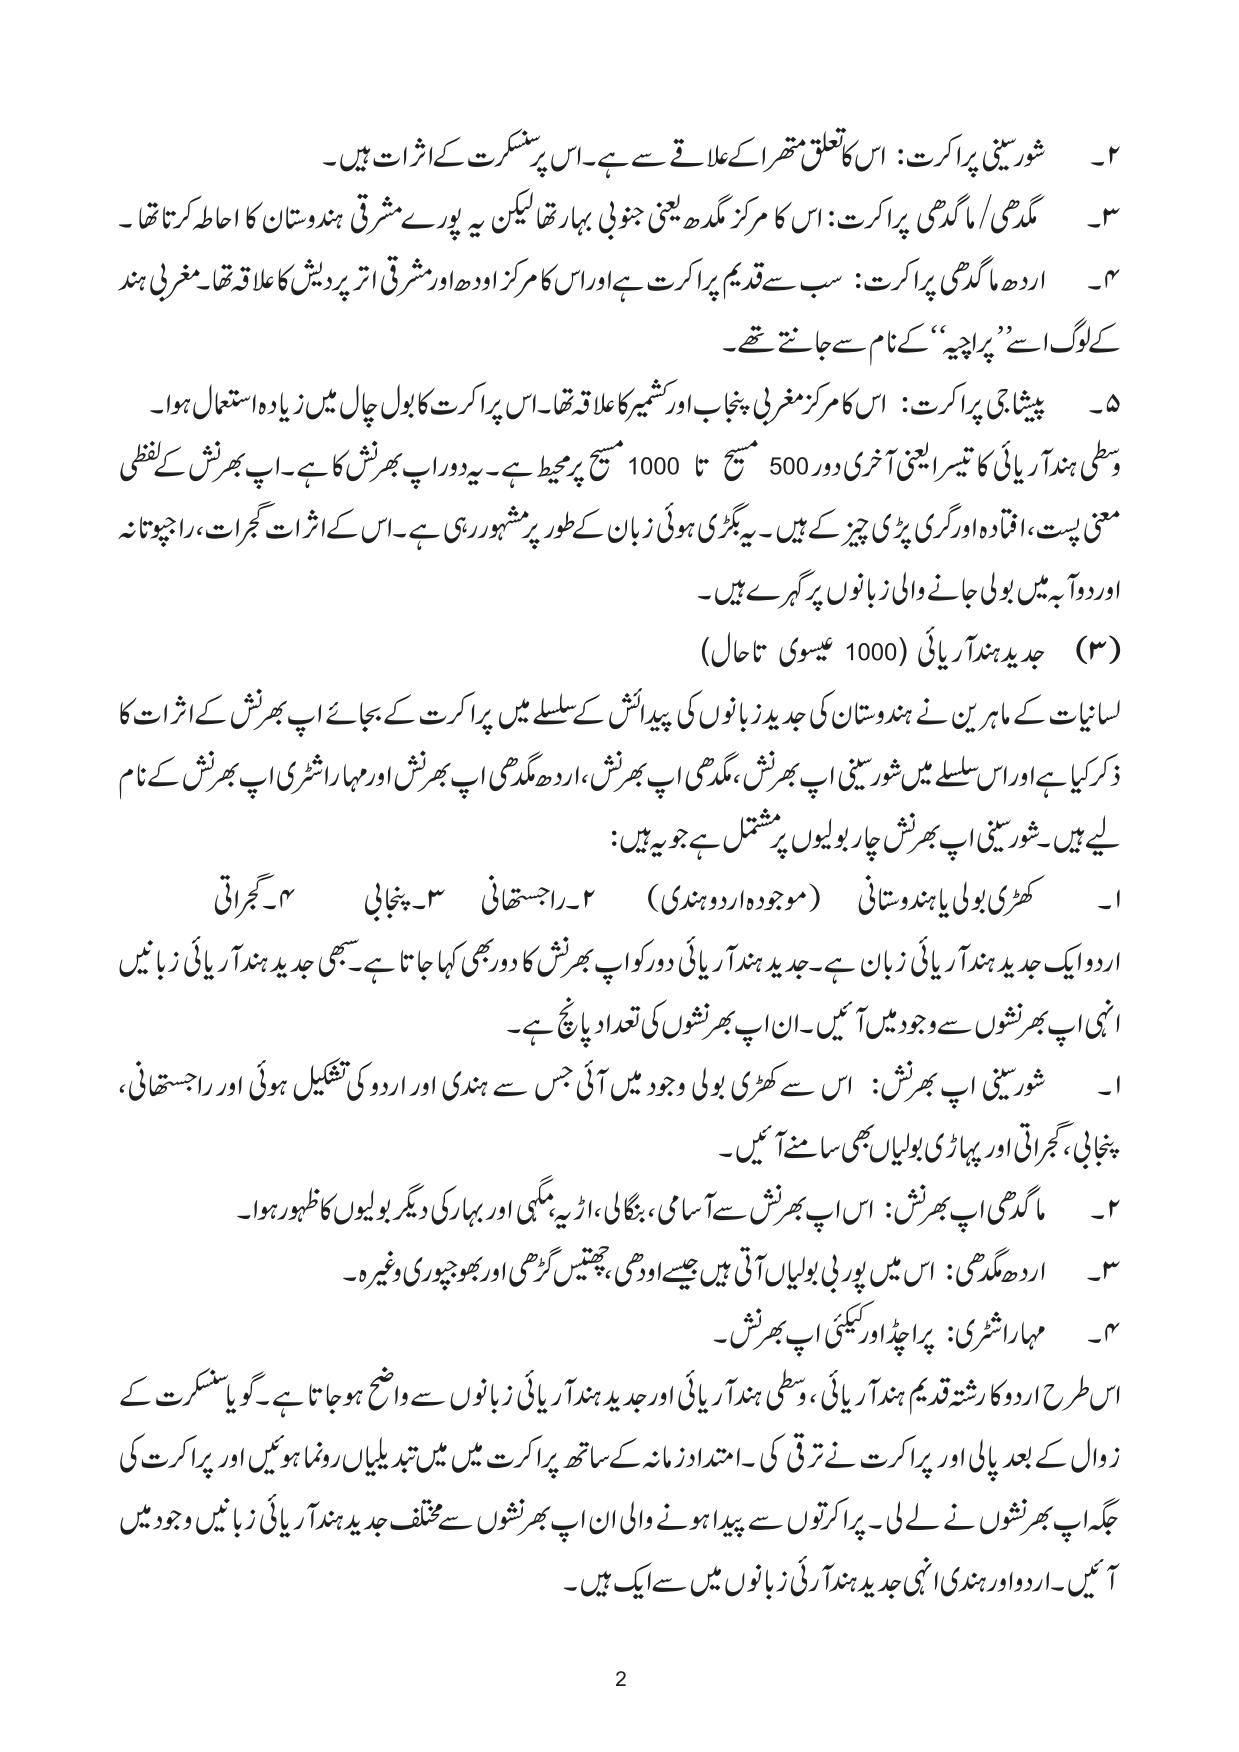 اردو زبان کا تاریخی پس منظر A Short History Of The Urdu Language